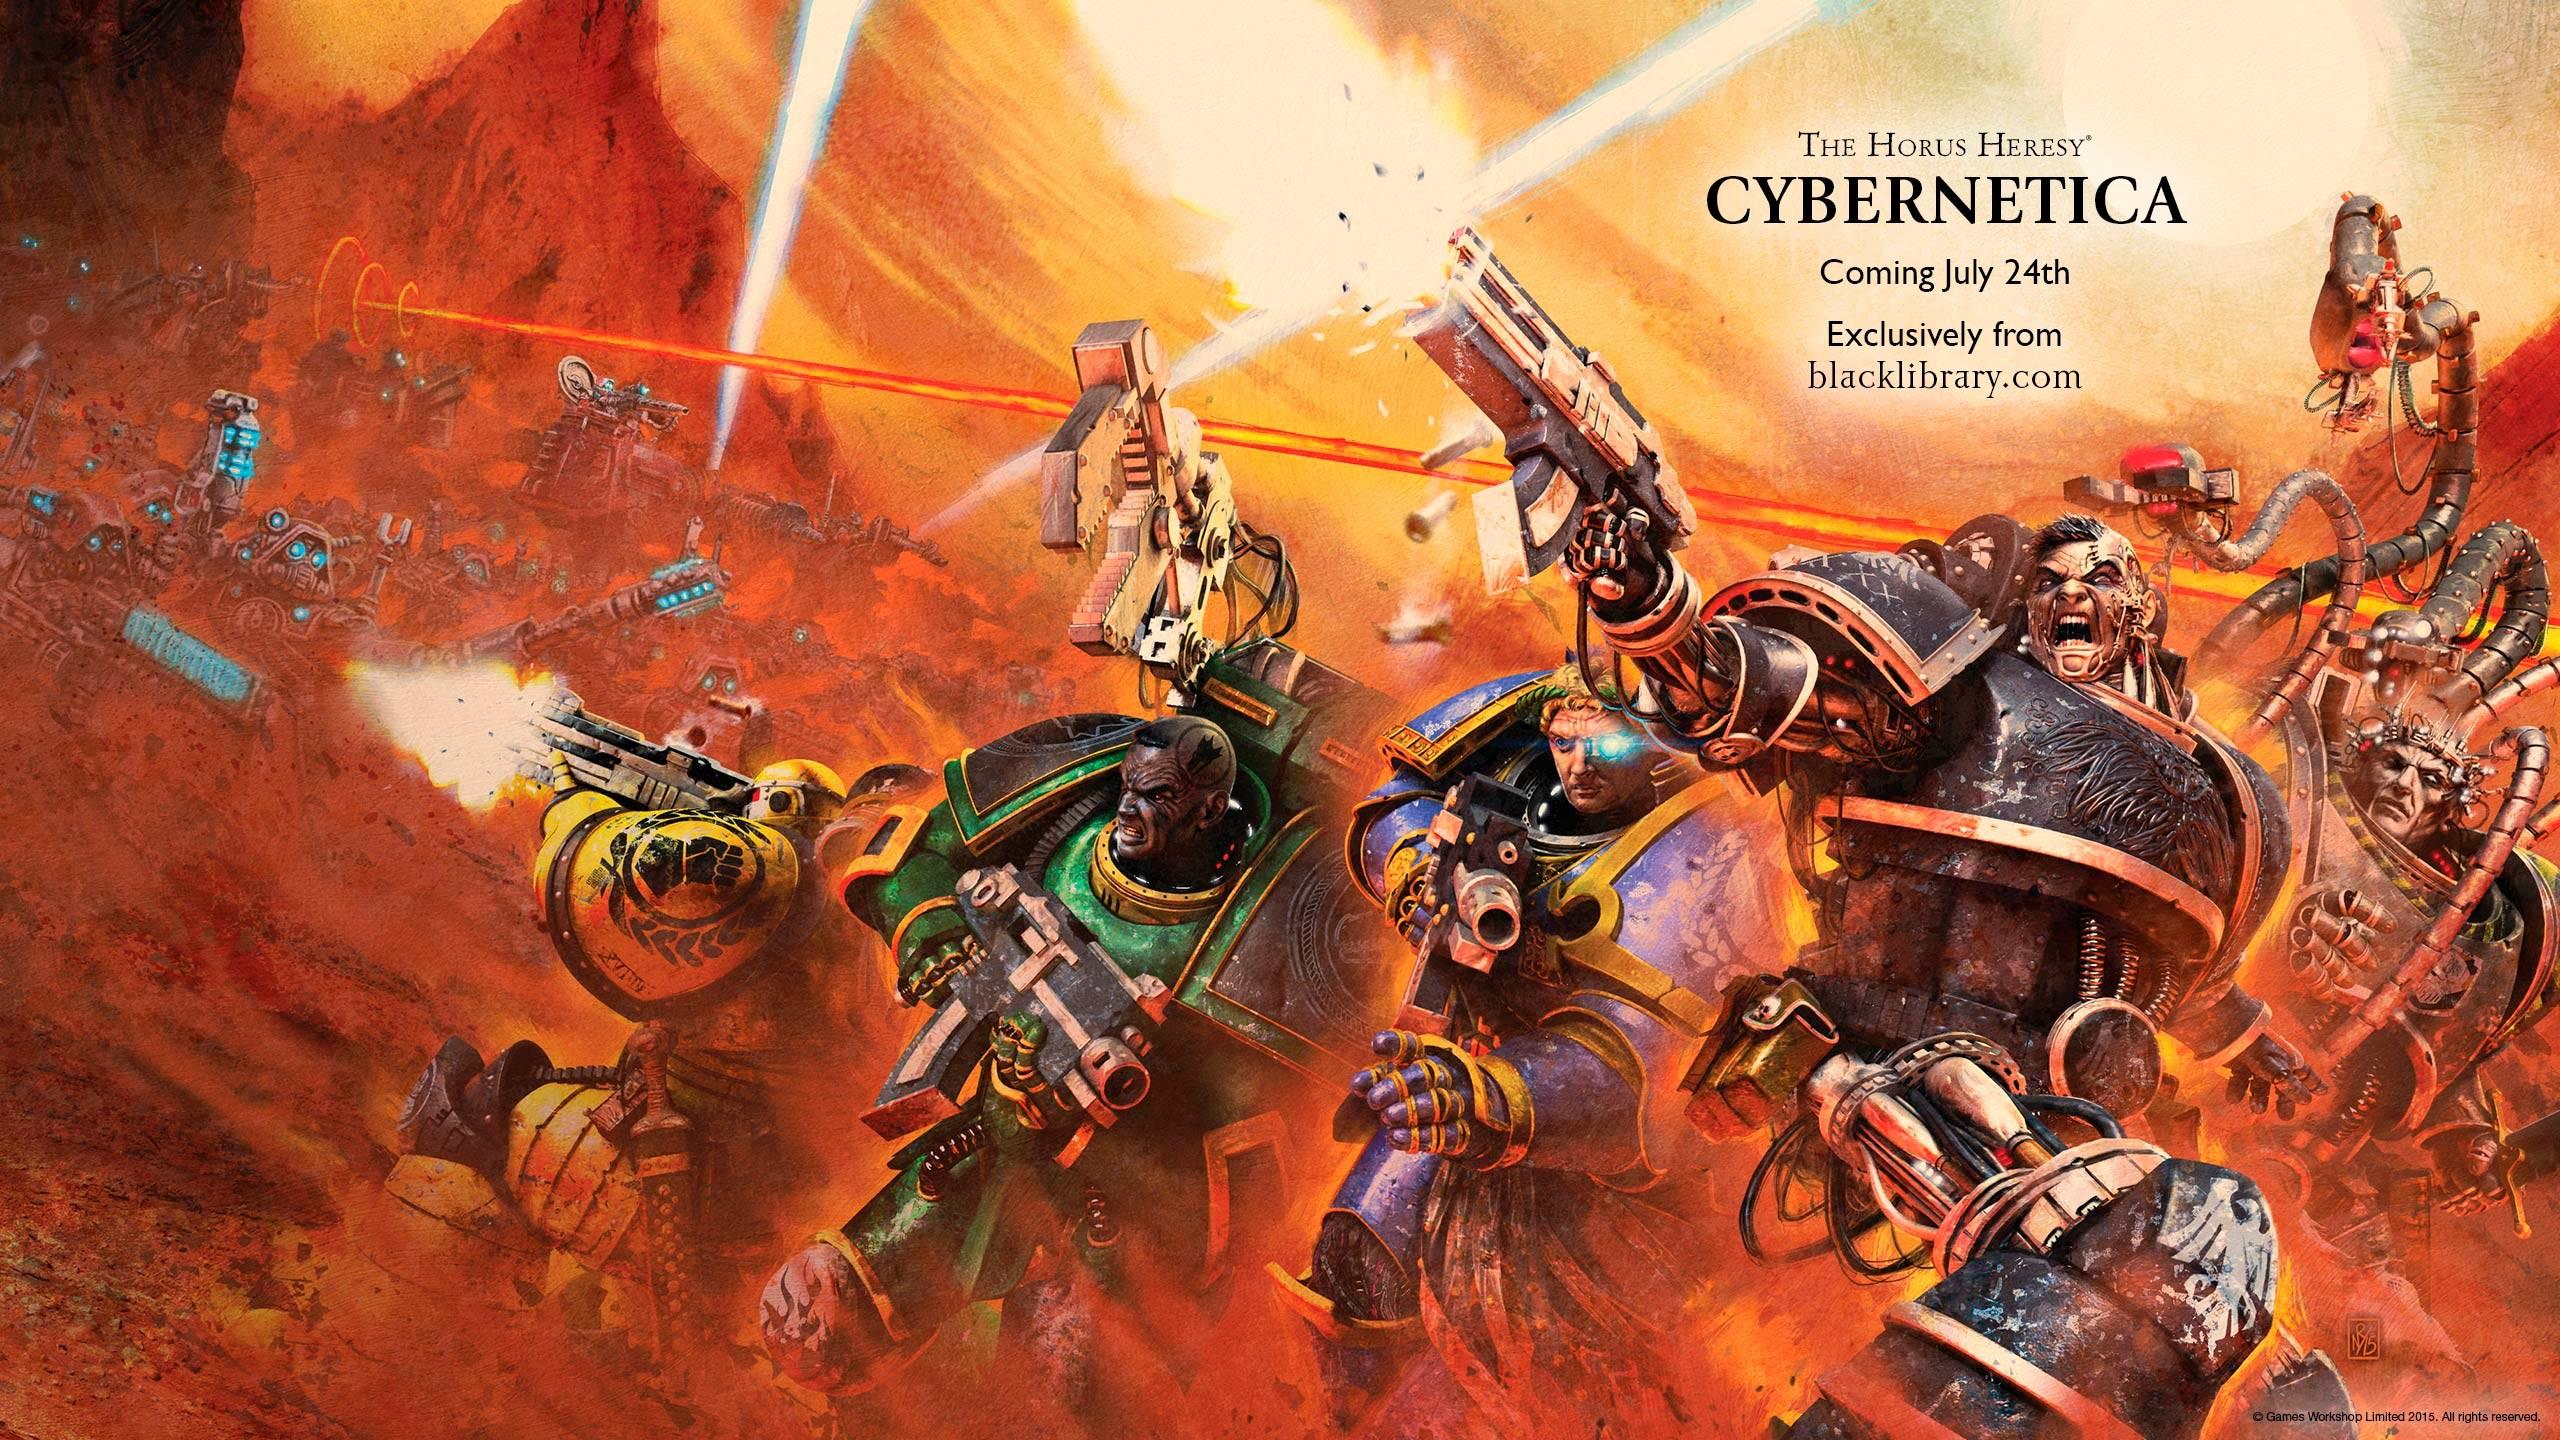 battle bolter chaos horus_heresy imperial_fists imperium implant_eye  iron_warriors landscape mars mechanicus neil_roberts raven_guard  salamanders skitarii …